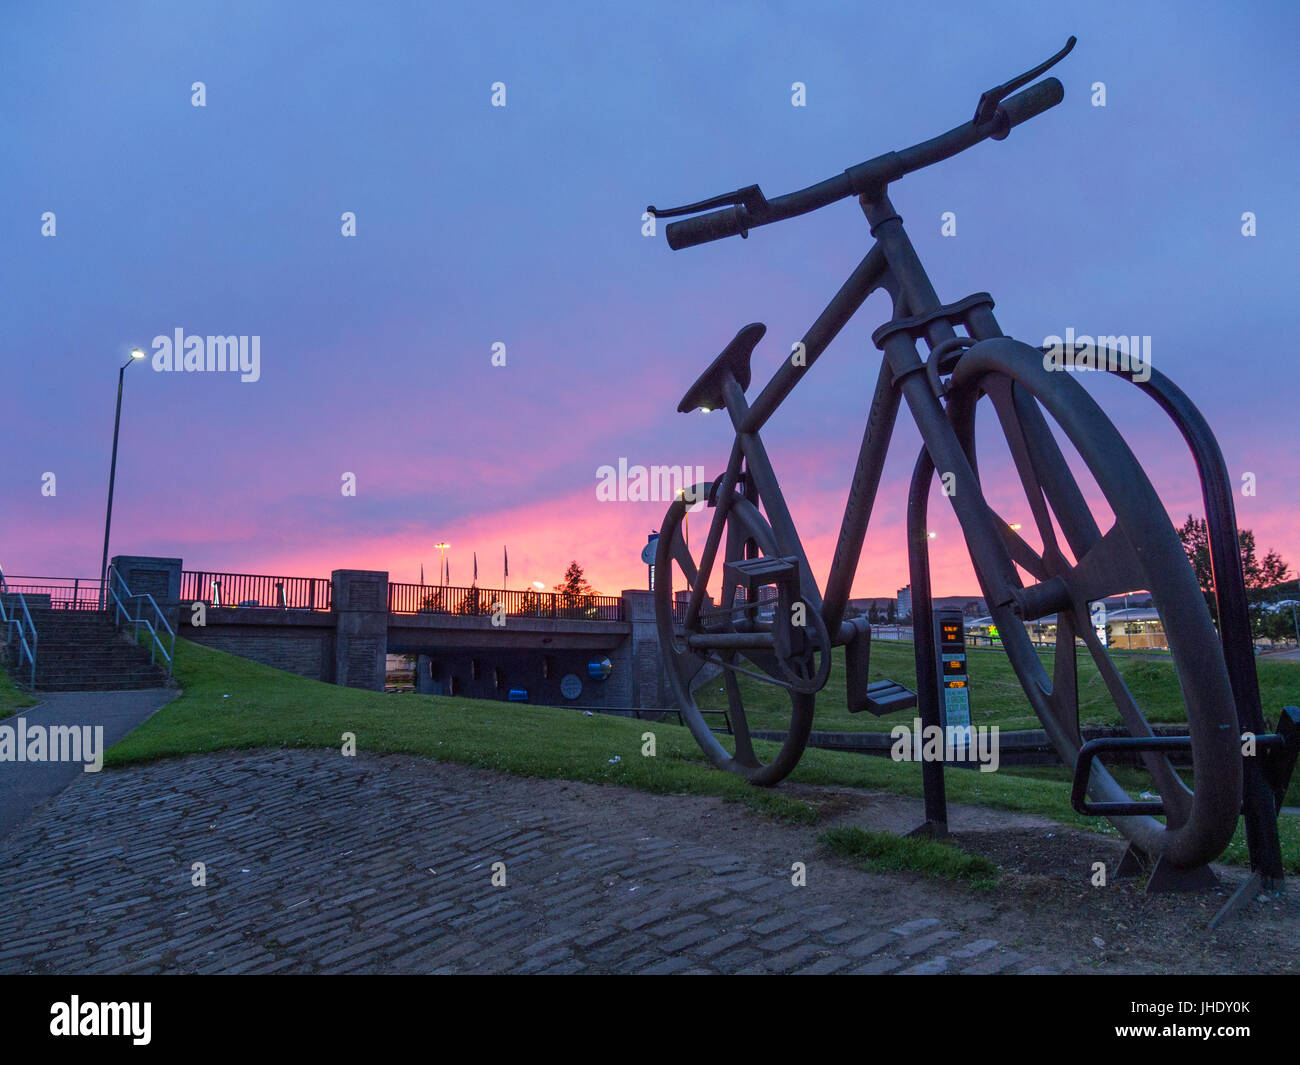 Bankies Bike statue - Clydebank - Stock Image